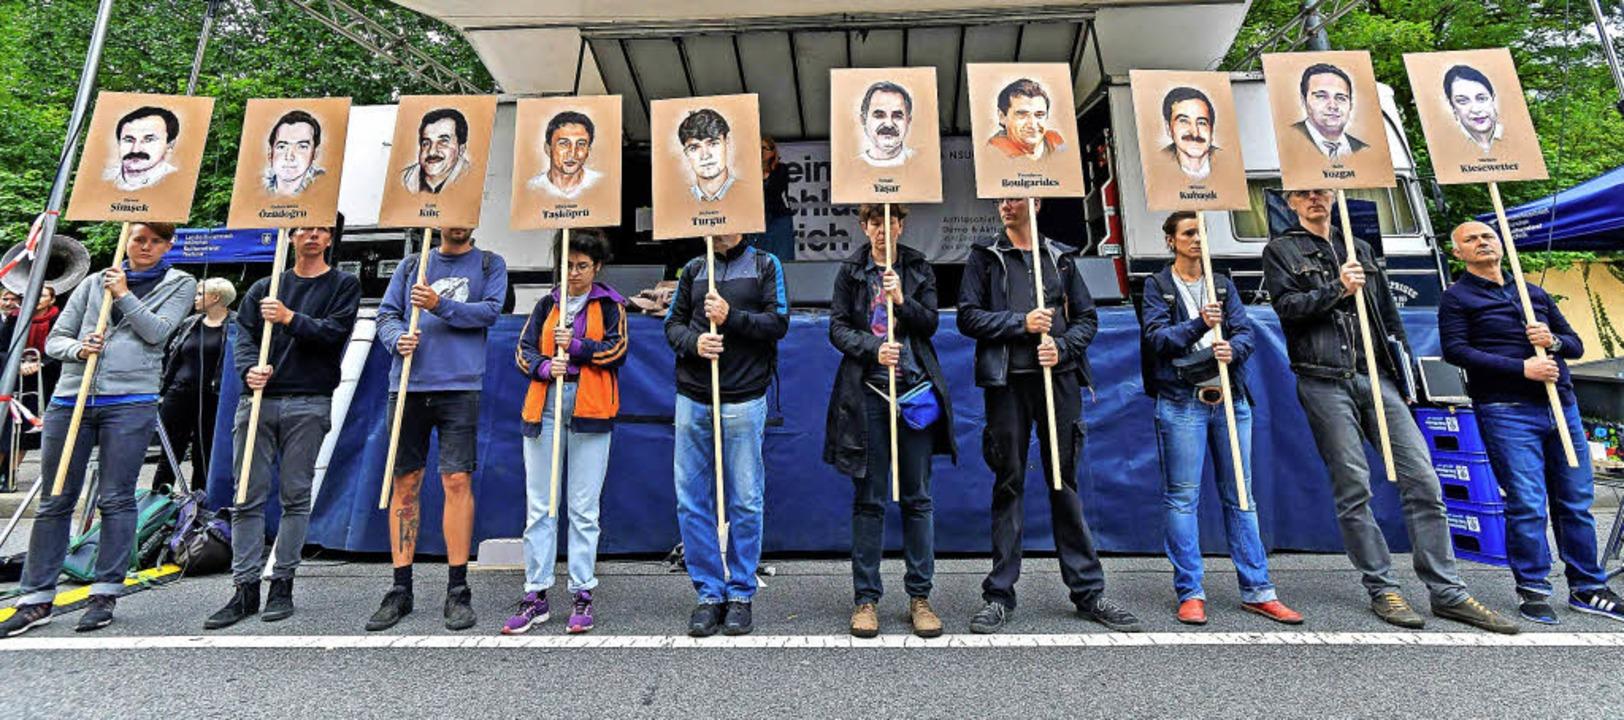 Demonstranten zeigen nahe des Gerichts...der rechtsradikalen Mördergruppe NSU.   | Foto: AFP